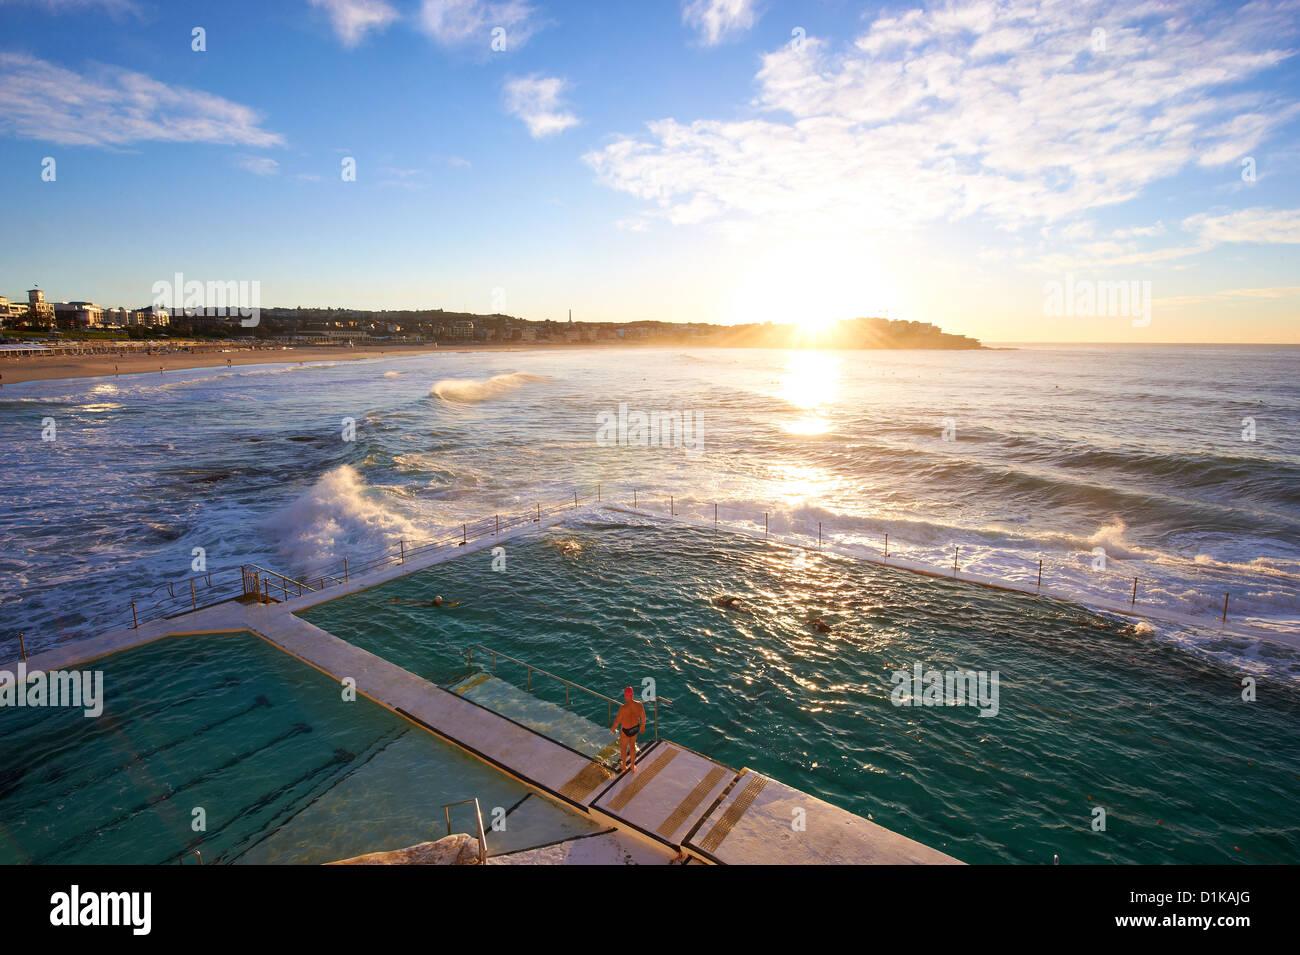 Bondi Icebergs, Sydney, New South Wales Australien Stockfoto